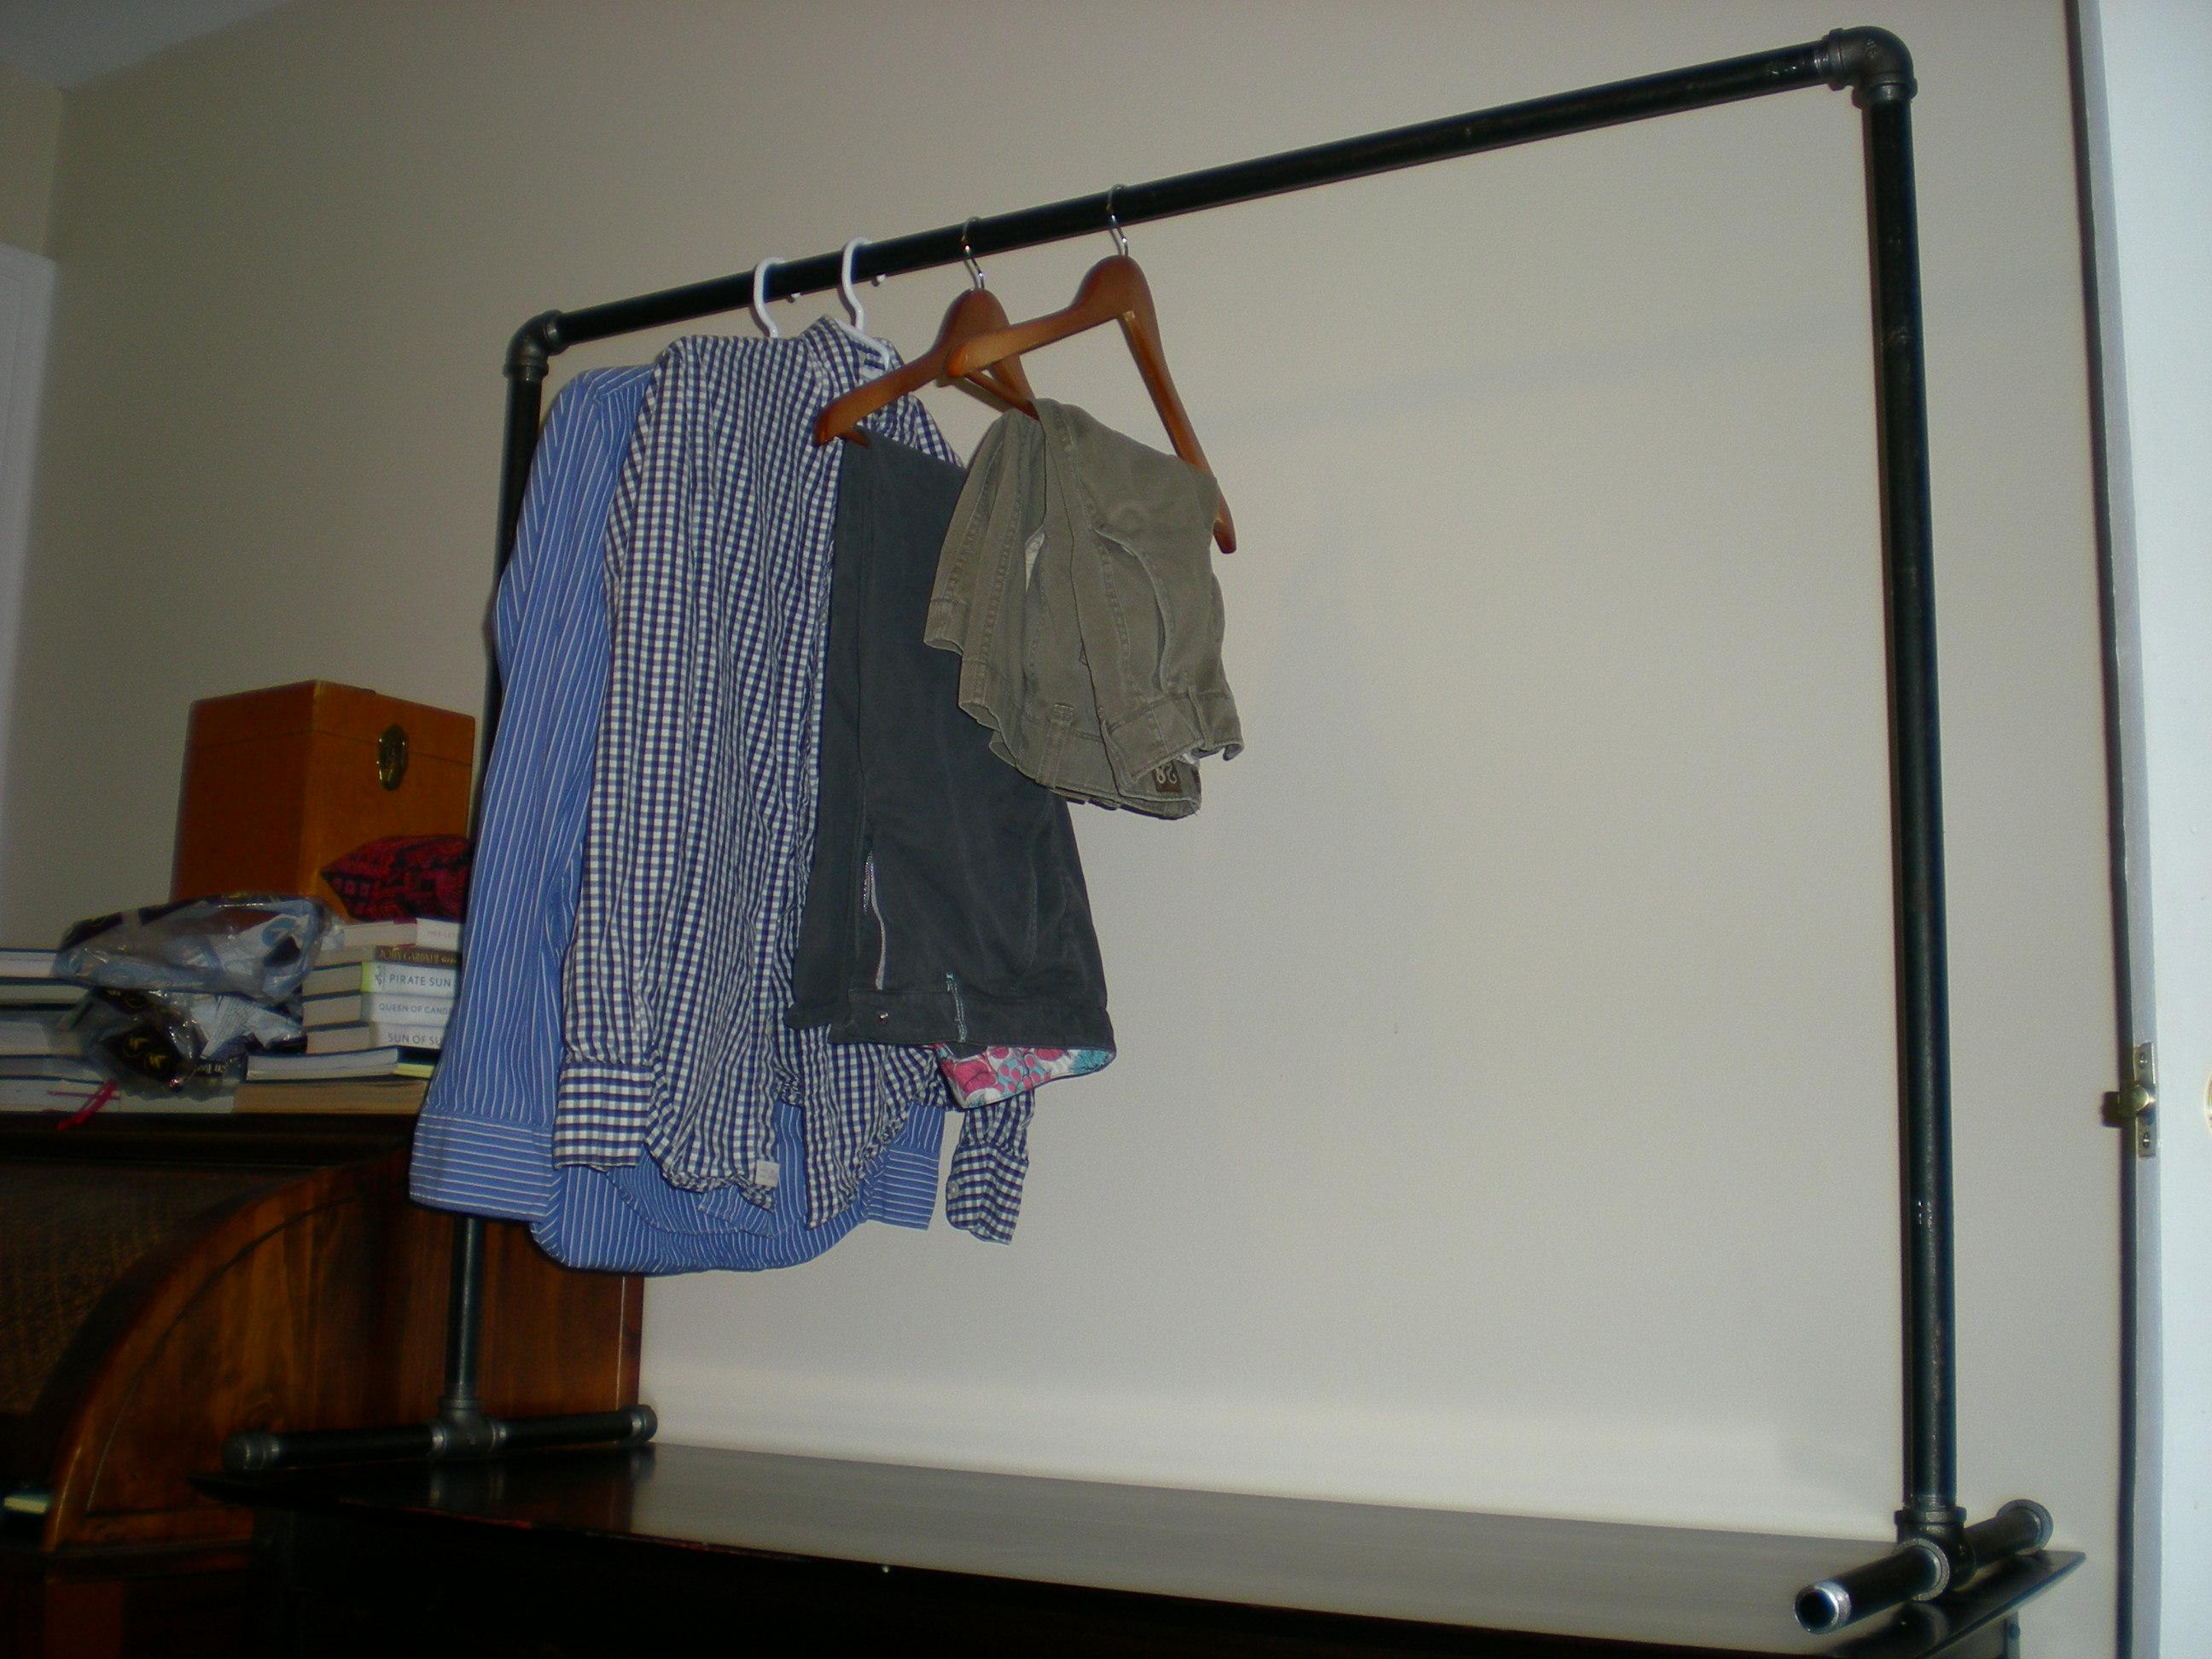 Free-standing clothing rack